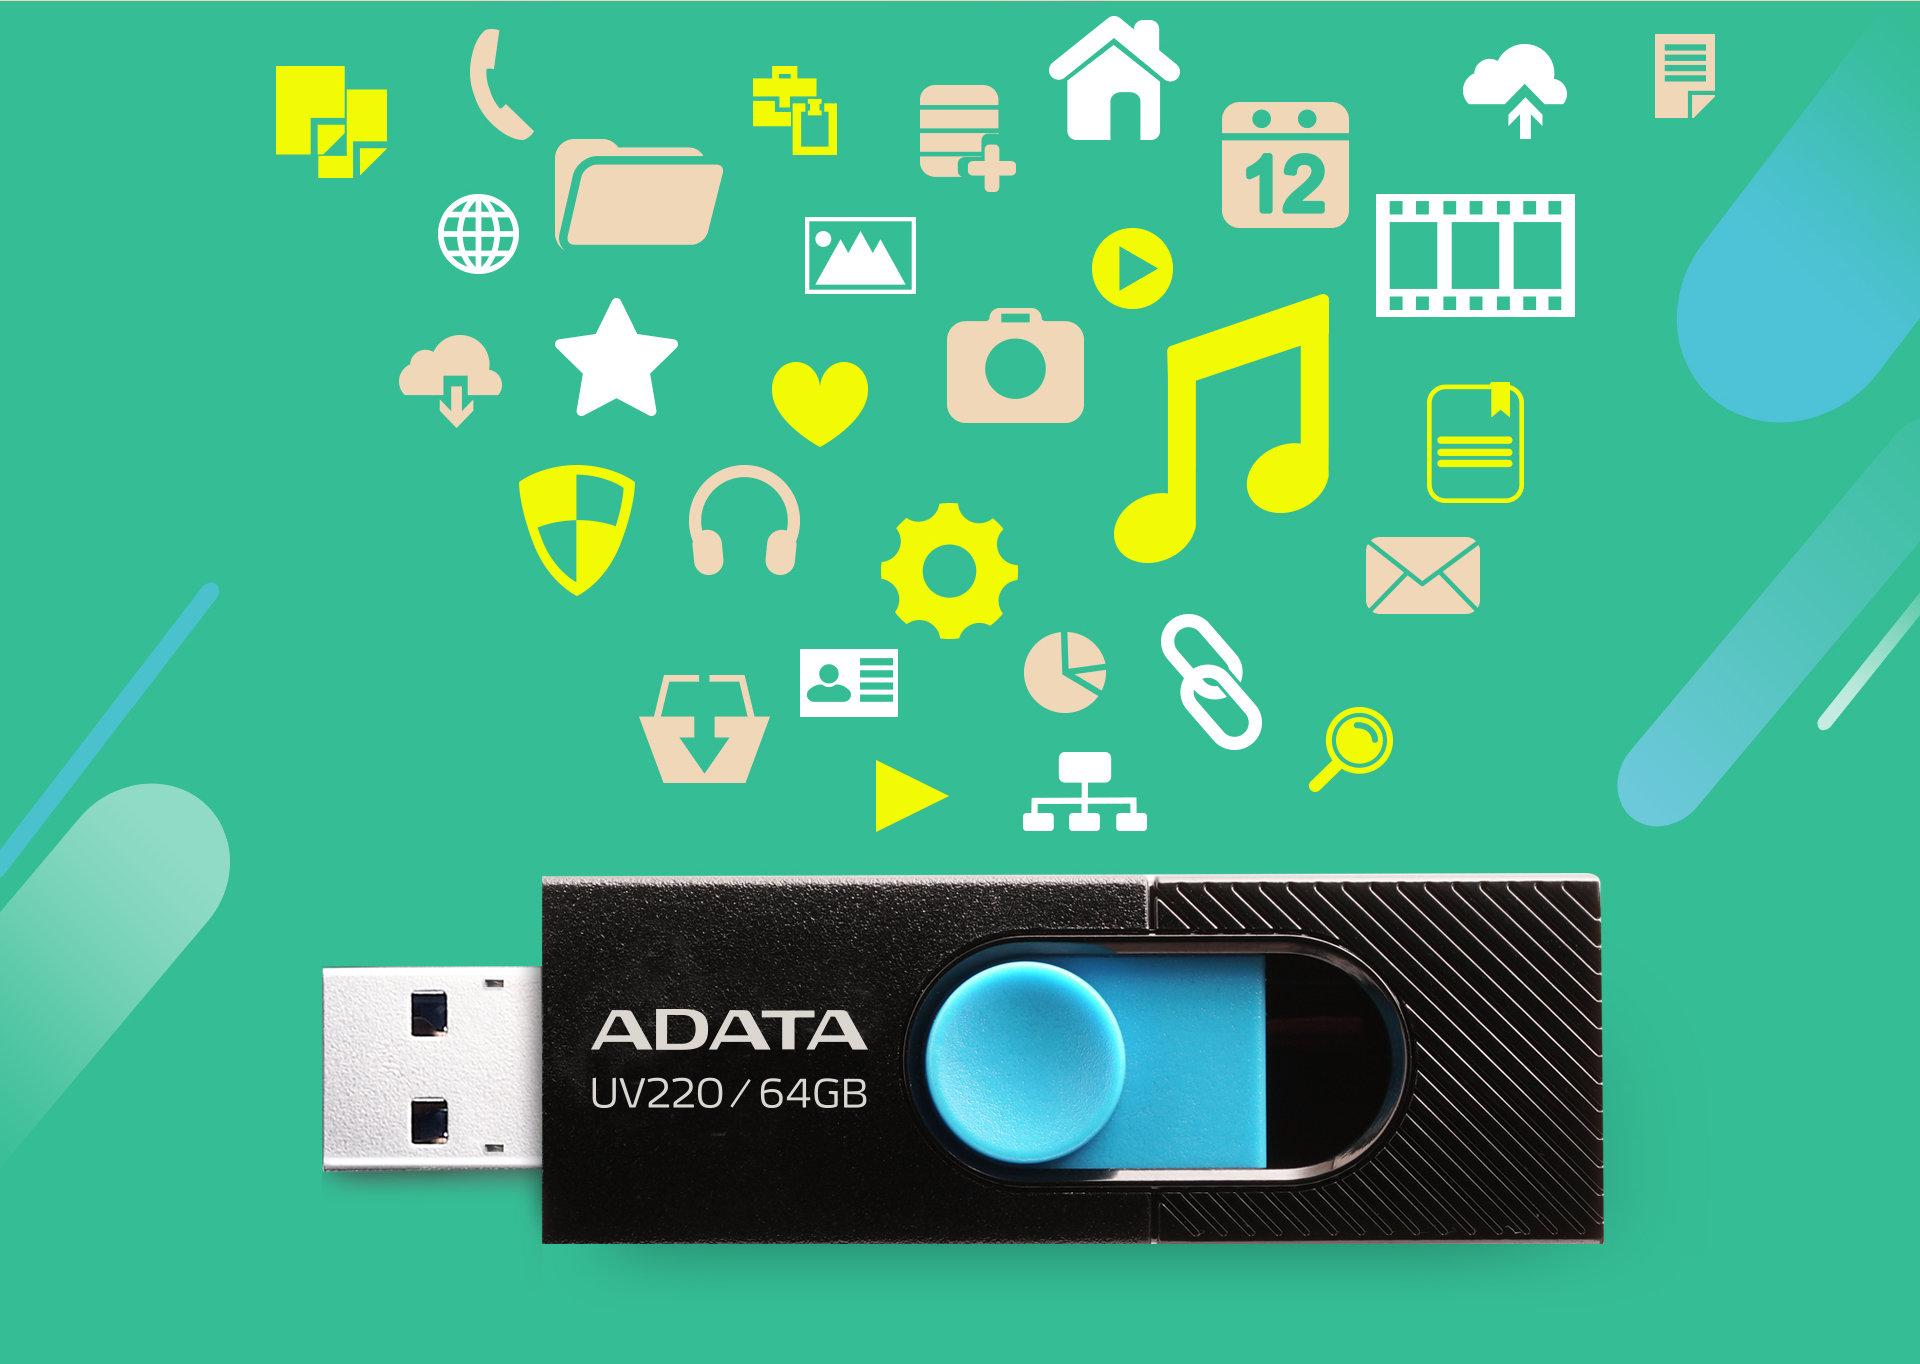 UV220 i UV320 - nowe pamięci flash od ADATA